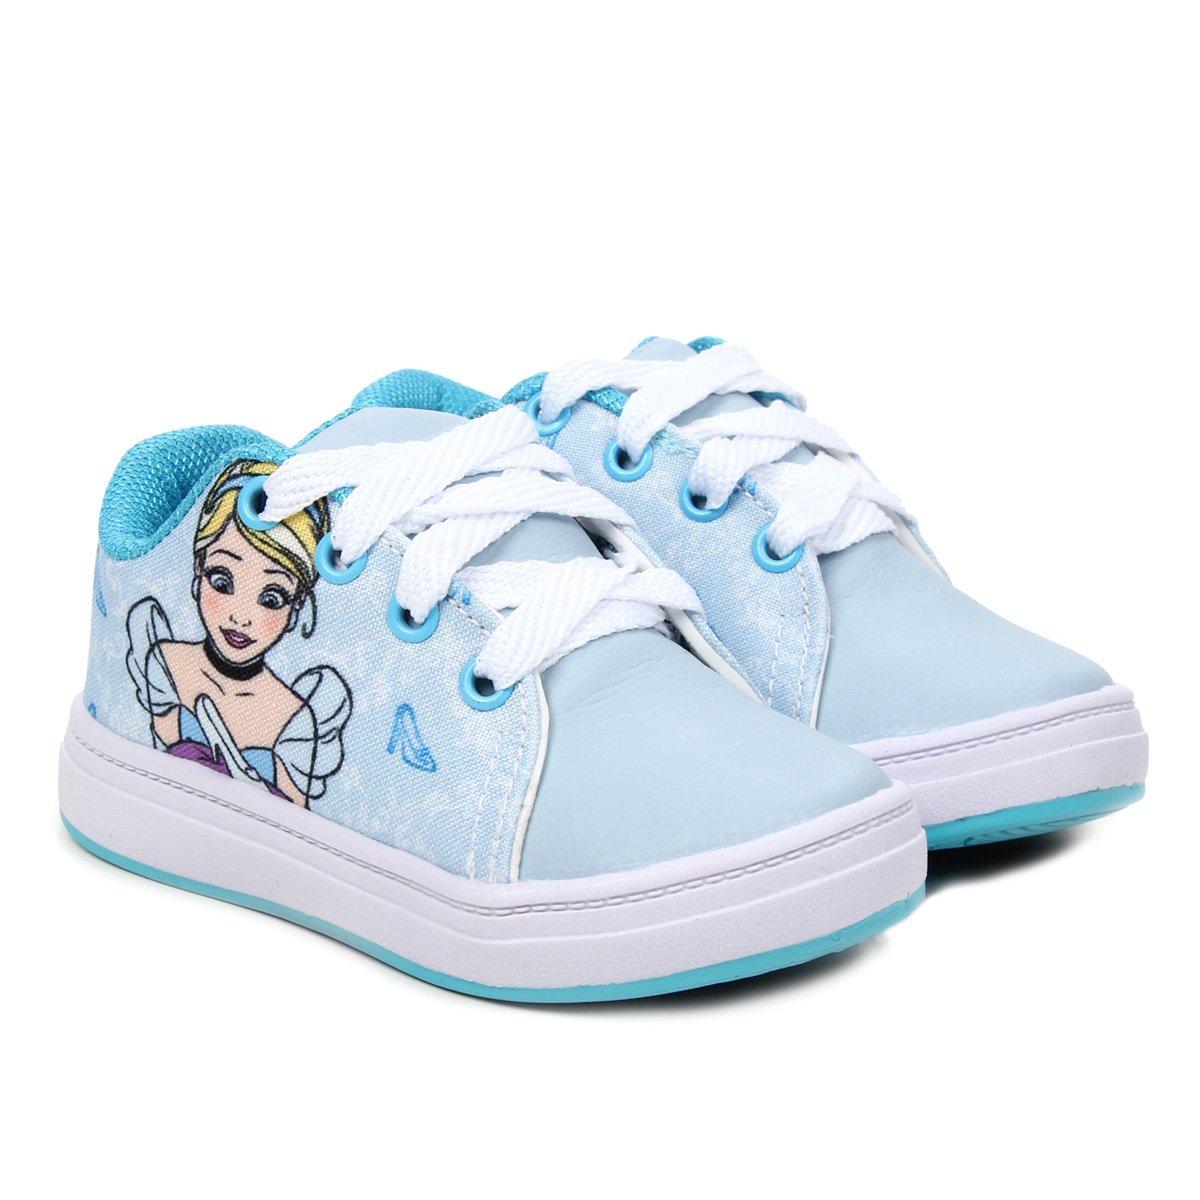 Tênis infantil Disney Princesa Cinderela